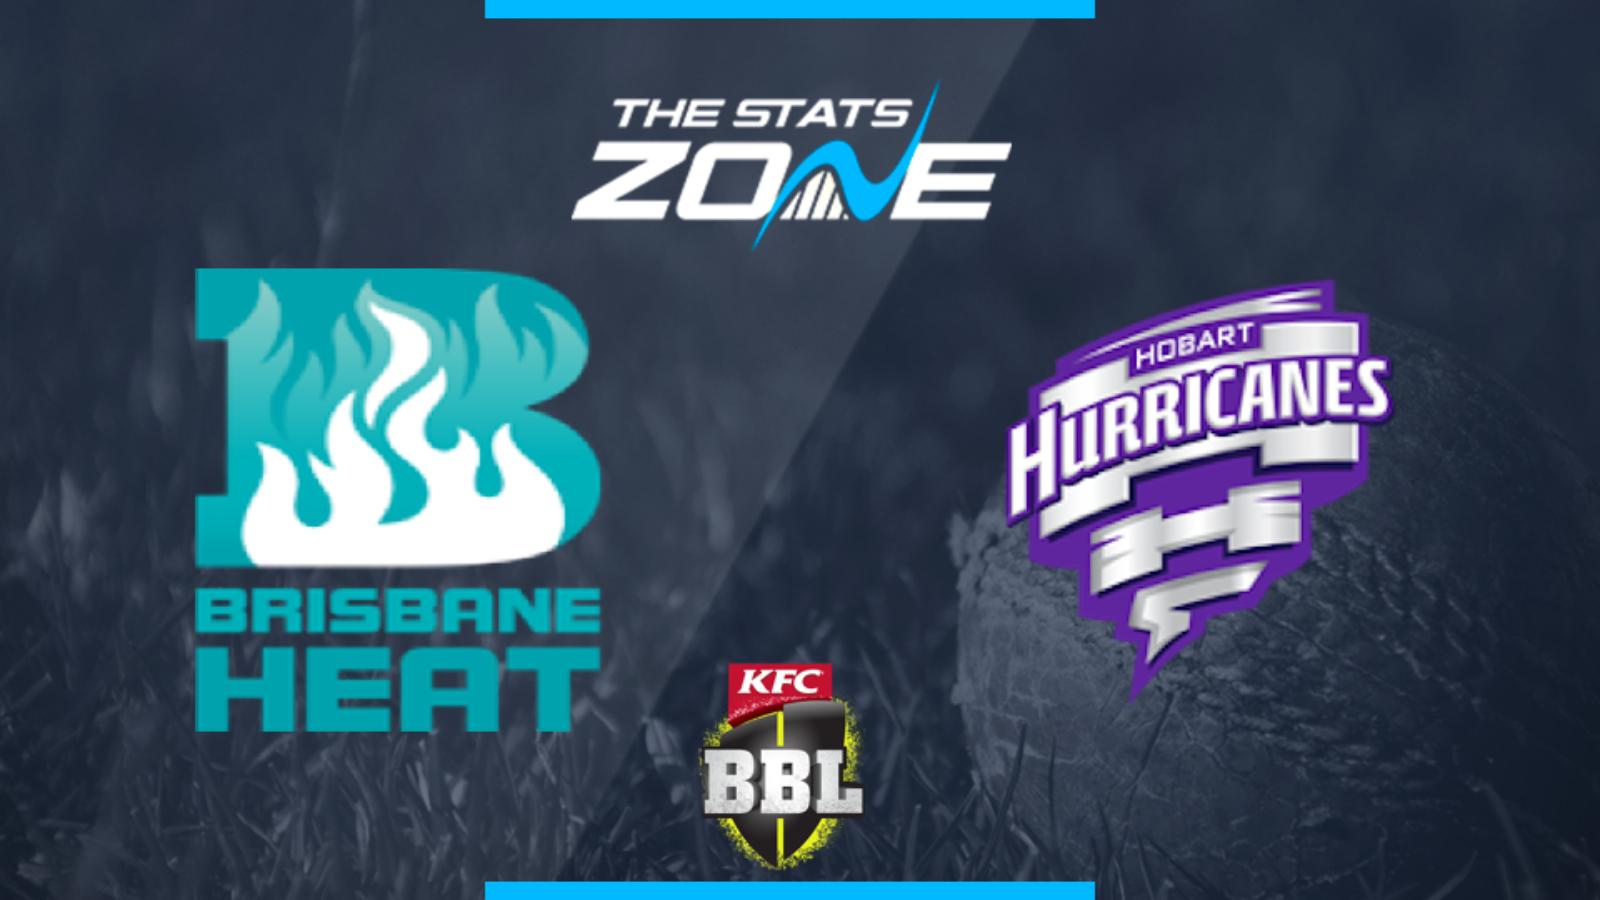 brisbane heat vs hobart hurricanes betting preview goal